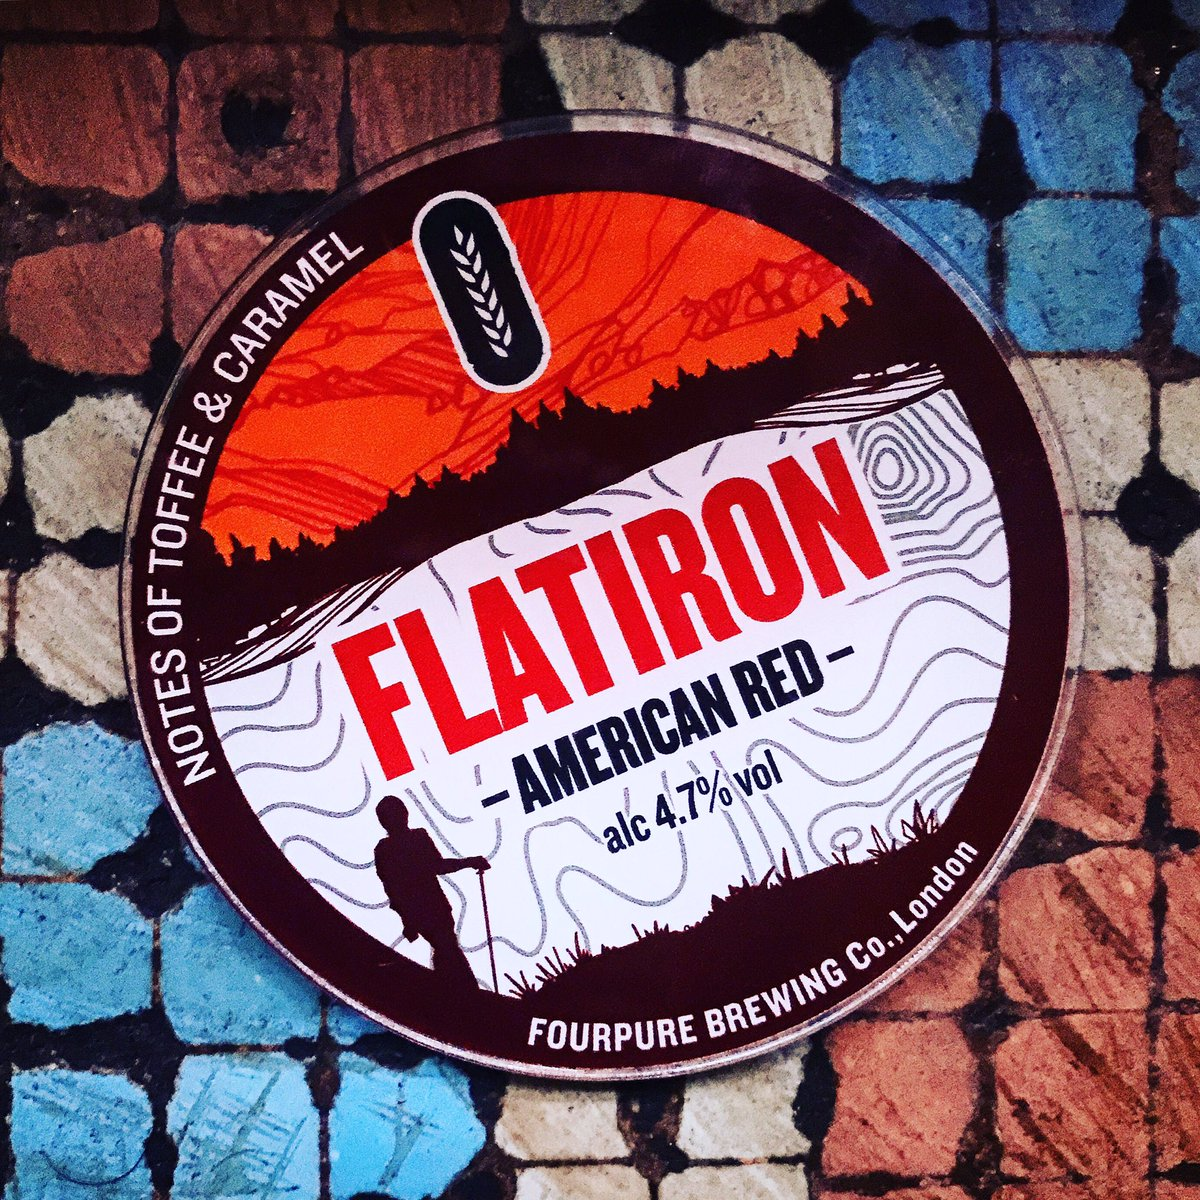 @fourpurebrewing Flatiron #american #red is on the #bar @ 4.7% 🍺😋🍺 #craft #beer #craftbeer https://t.co/yDiEL1YKuR